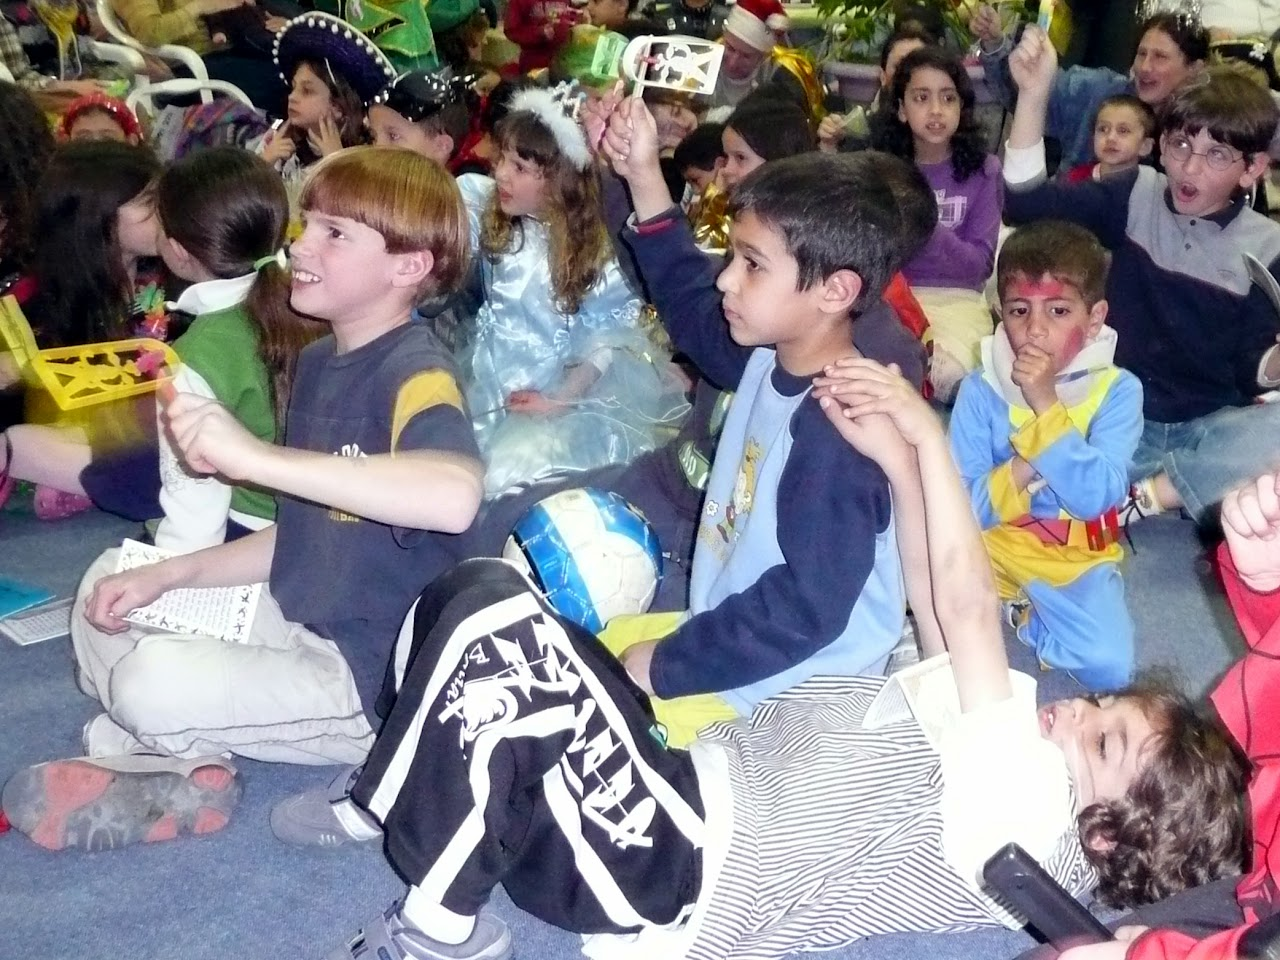 Purim 2008  - 2008-03-20 18.55.44-1.jpg